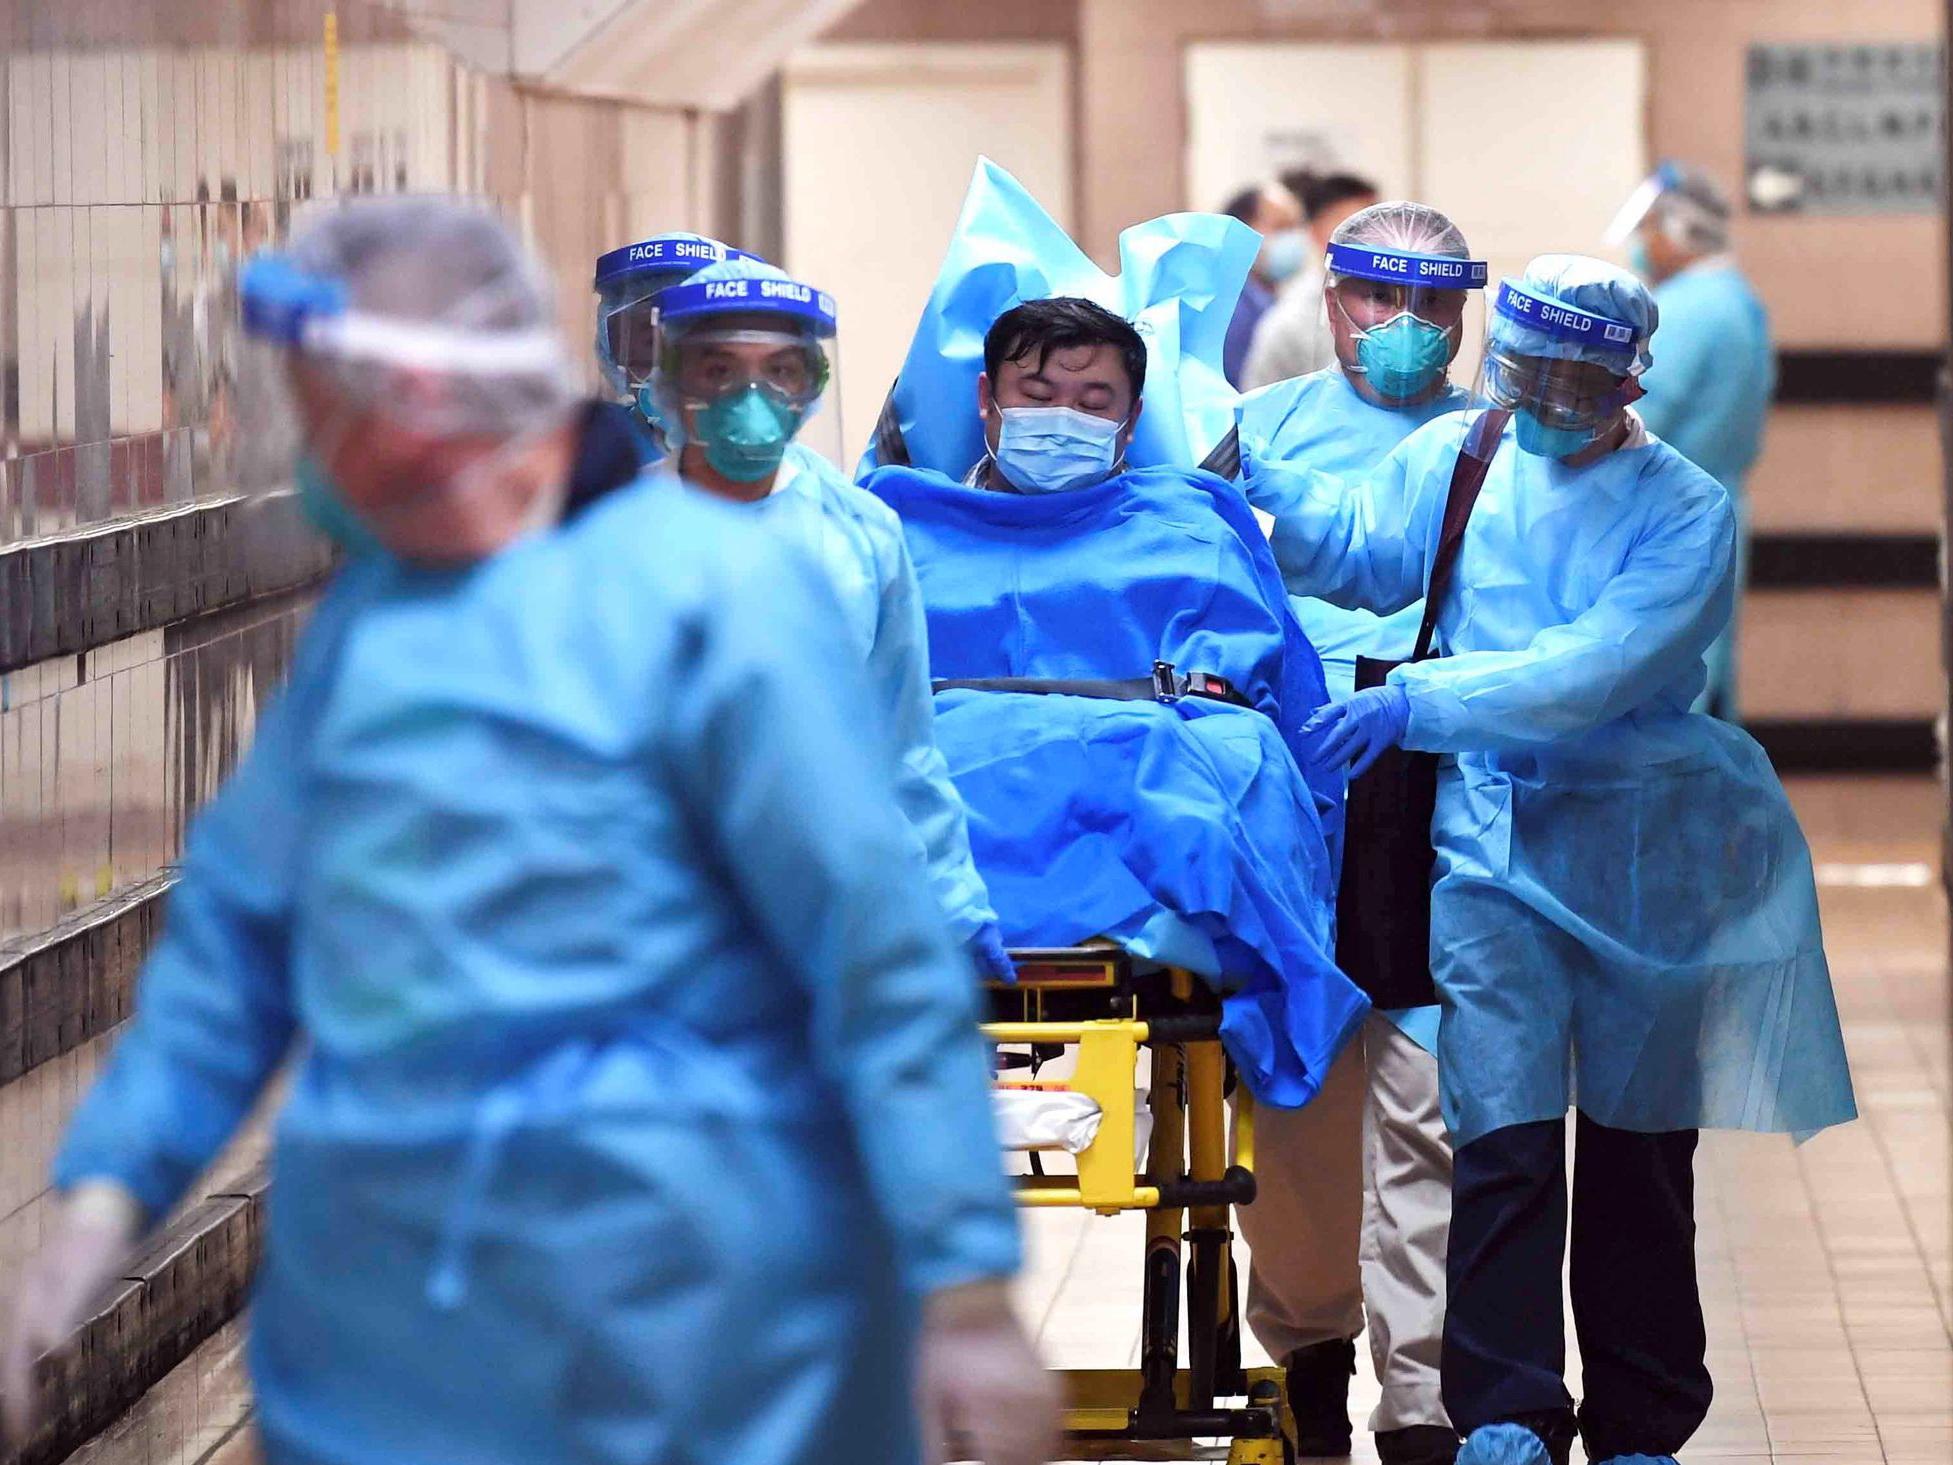 Минздрав Азербайджана издал приказ в связи с коронавирусом